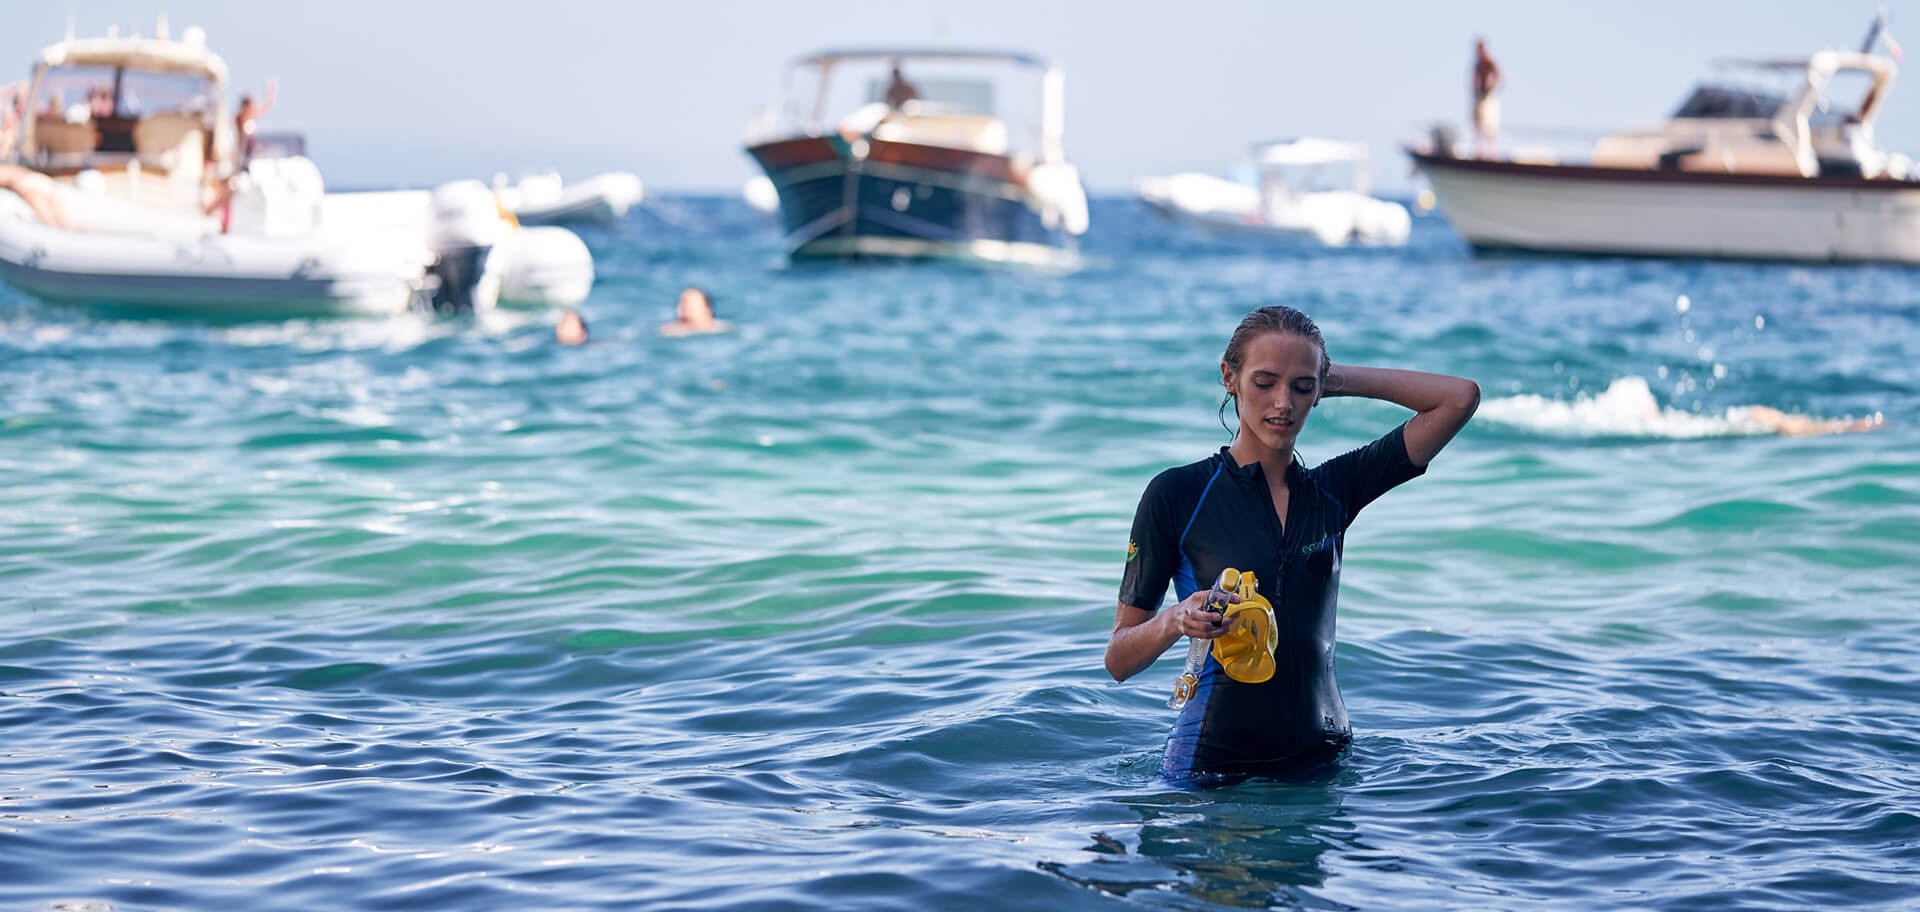 EcoStinger Sun Protection Swimwear Full Body Swimsuit UPF50+